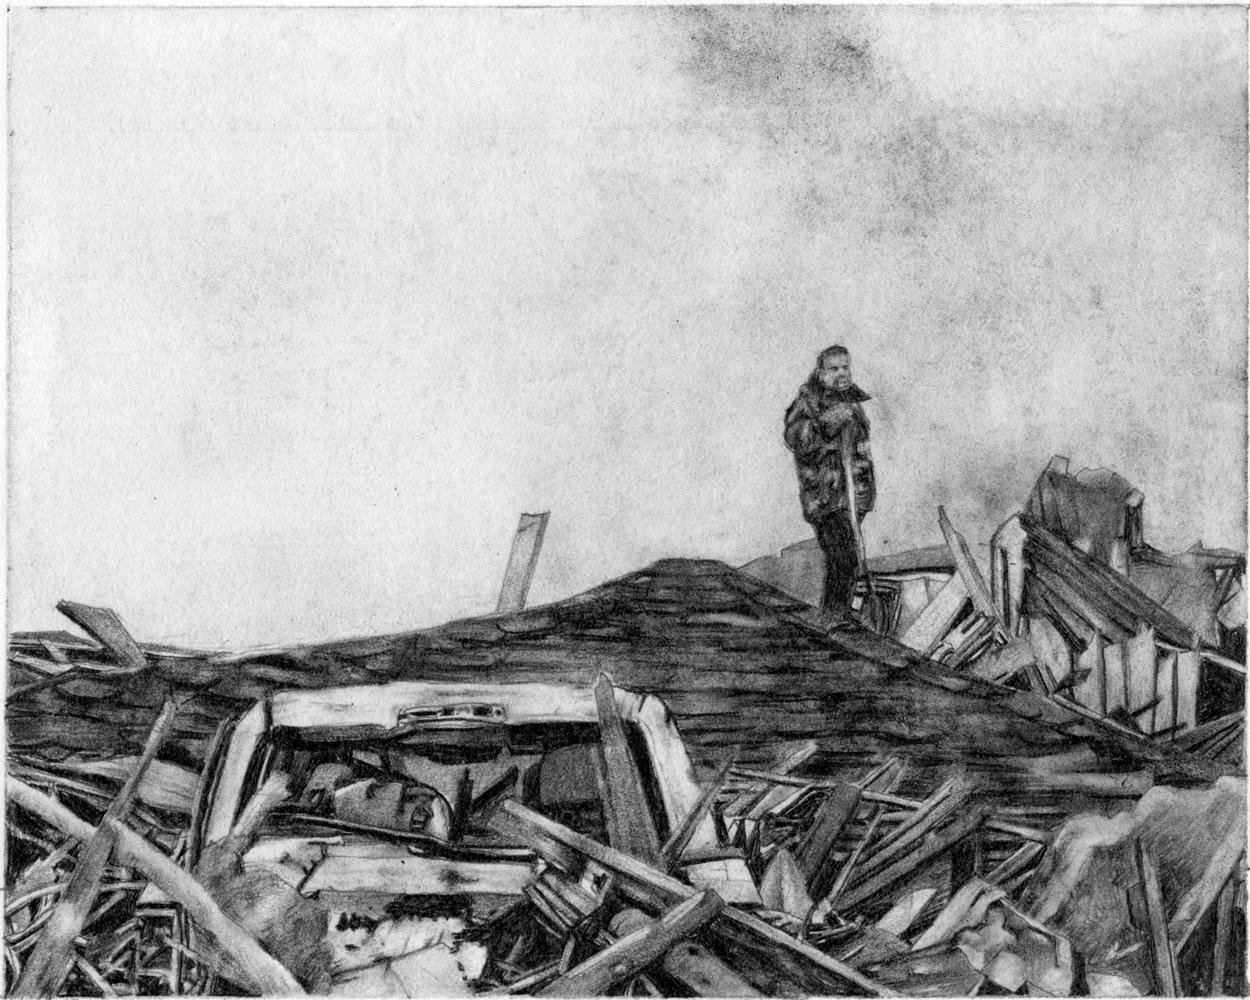 Samantha Scherer, Buried, 2018, graphite on paper, 10 x 10 inches, framed, $950.